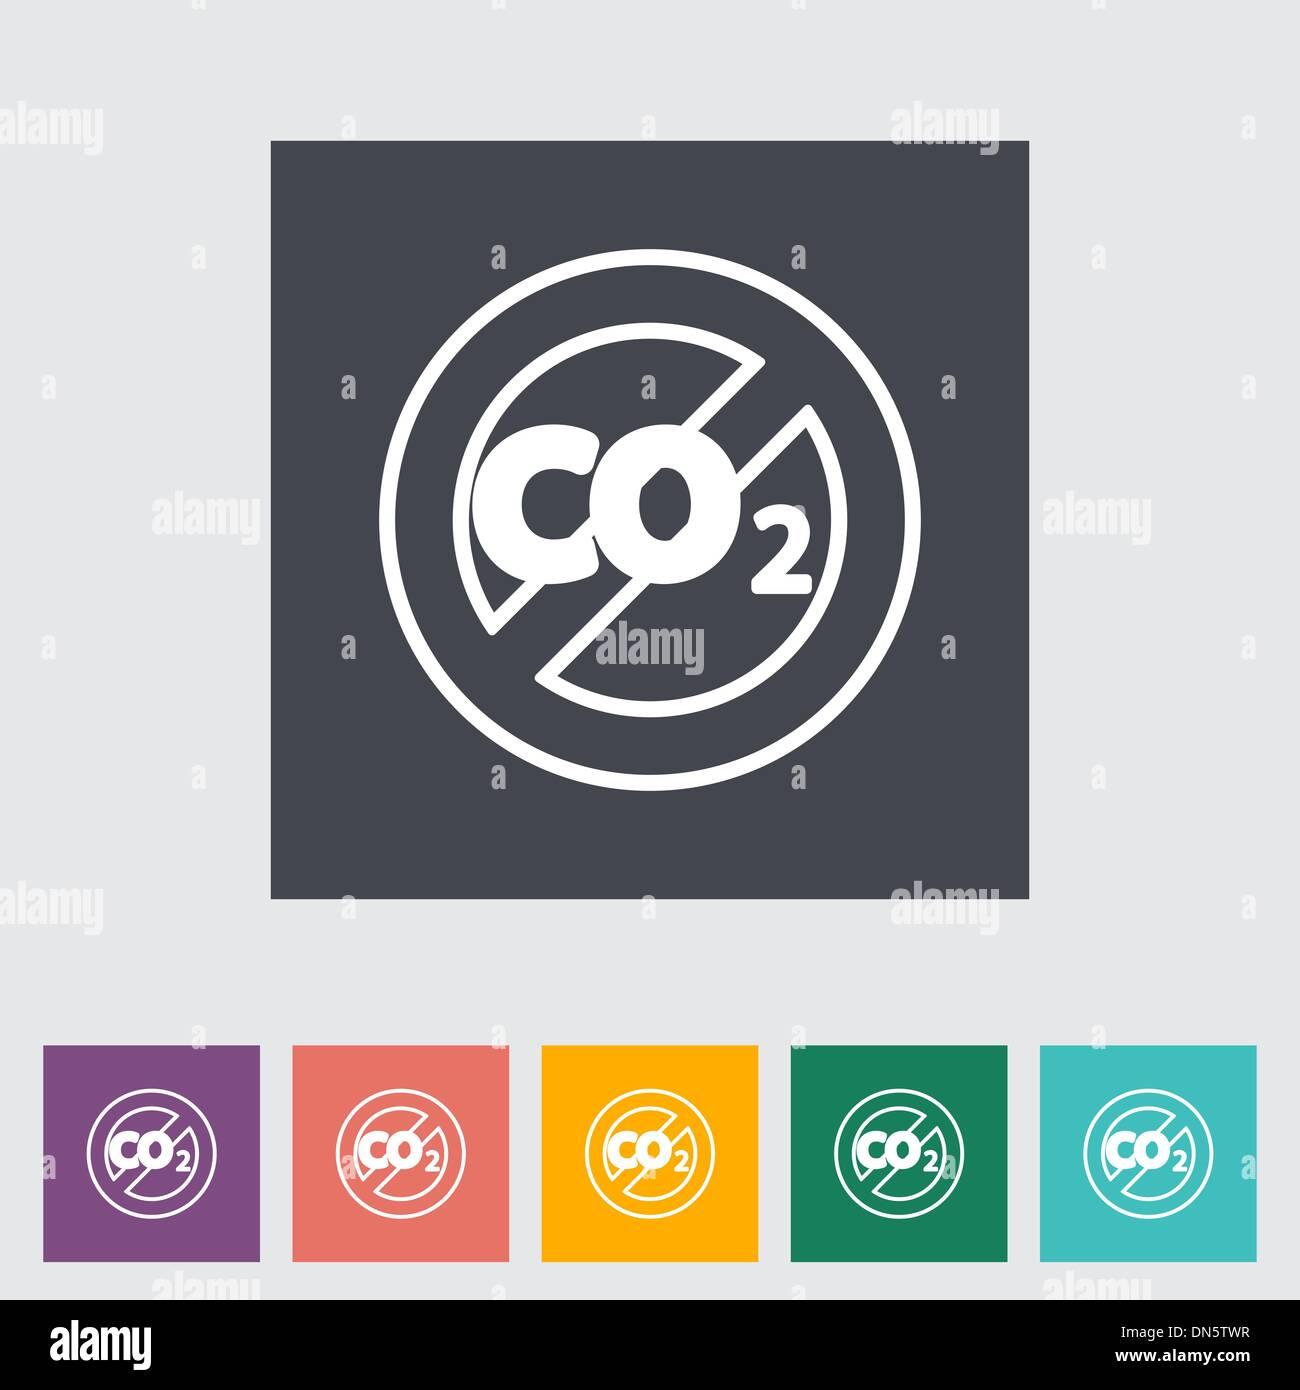 CO2 flat icon - Stock Image